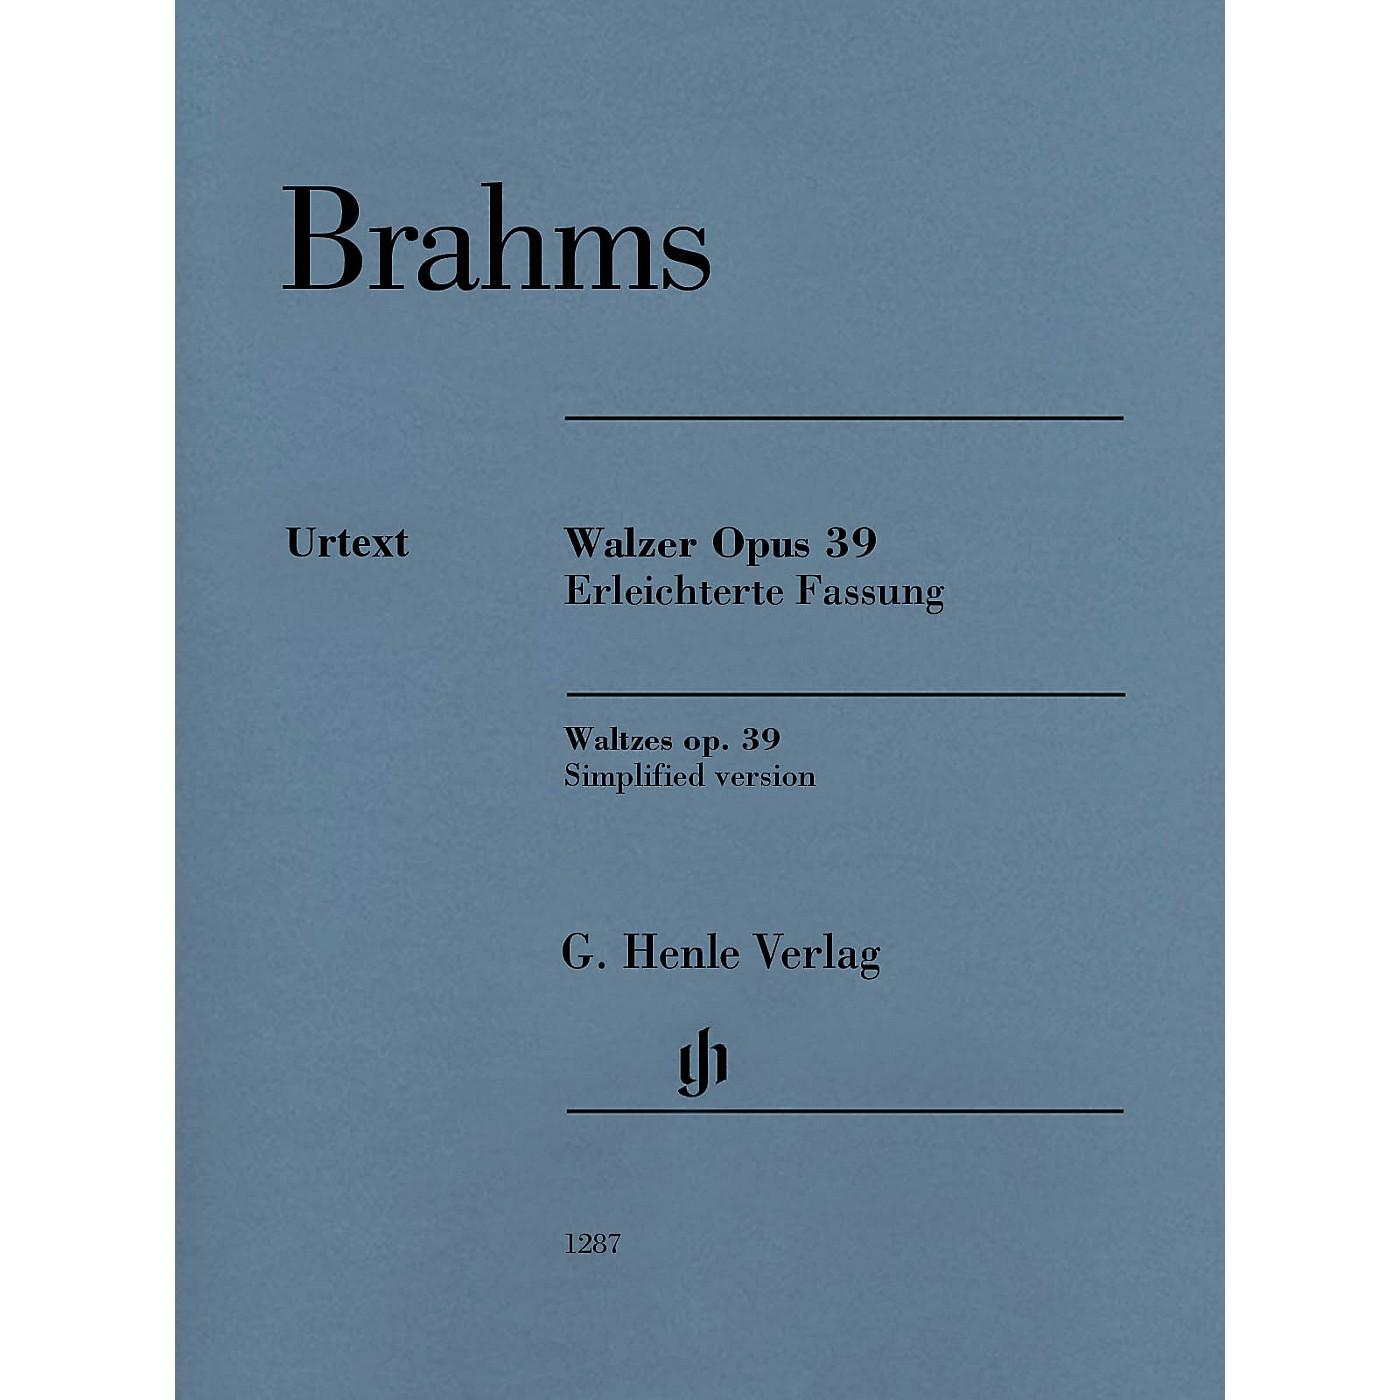 G. Henle Verlag Waltzes Op. 39 (Simplified Arrangement by Brahms) Henle Music Folios Series Softcover thumbnail